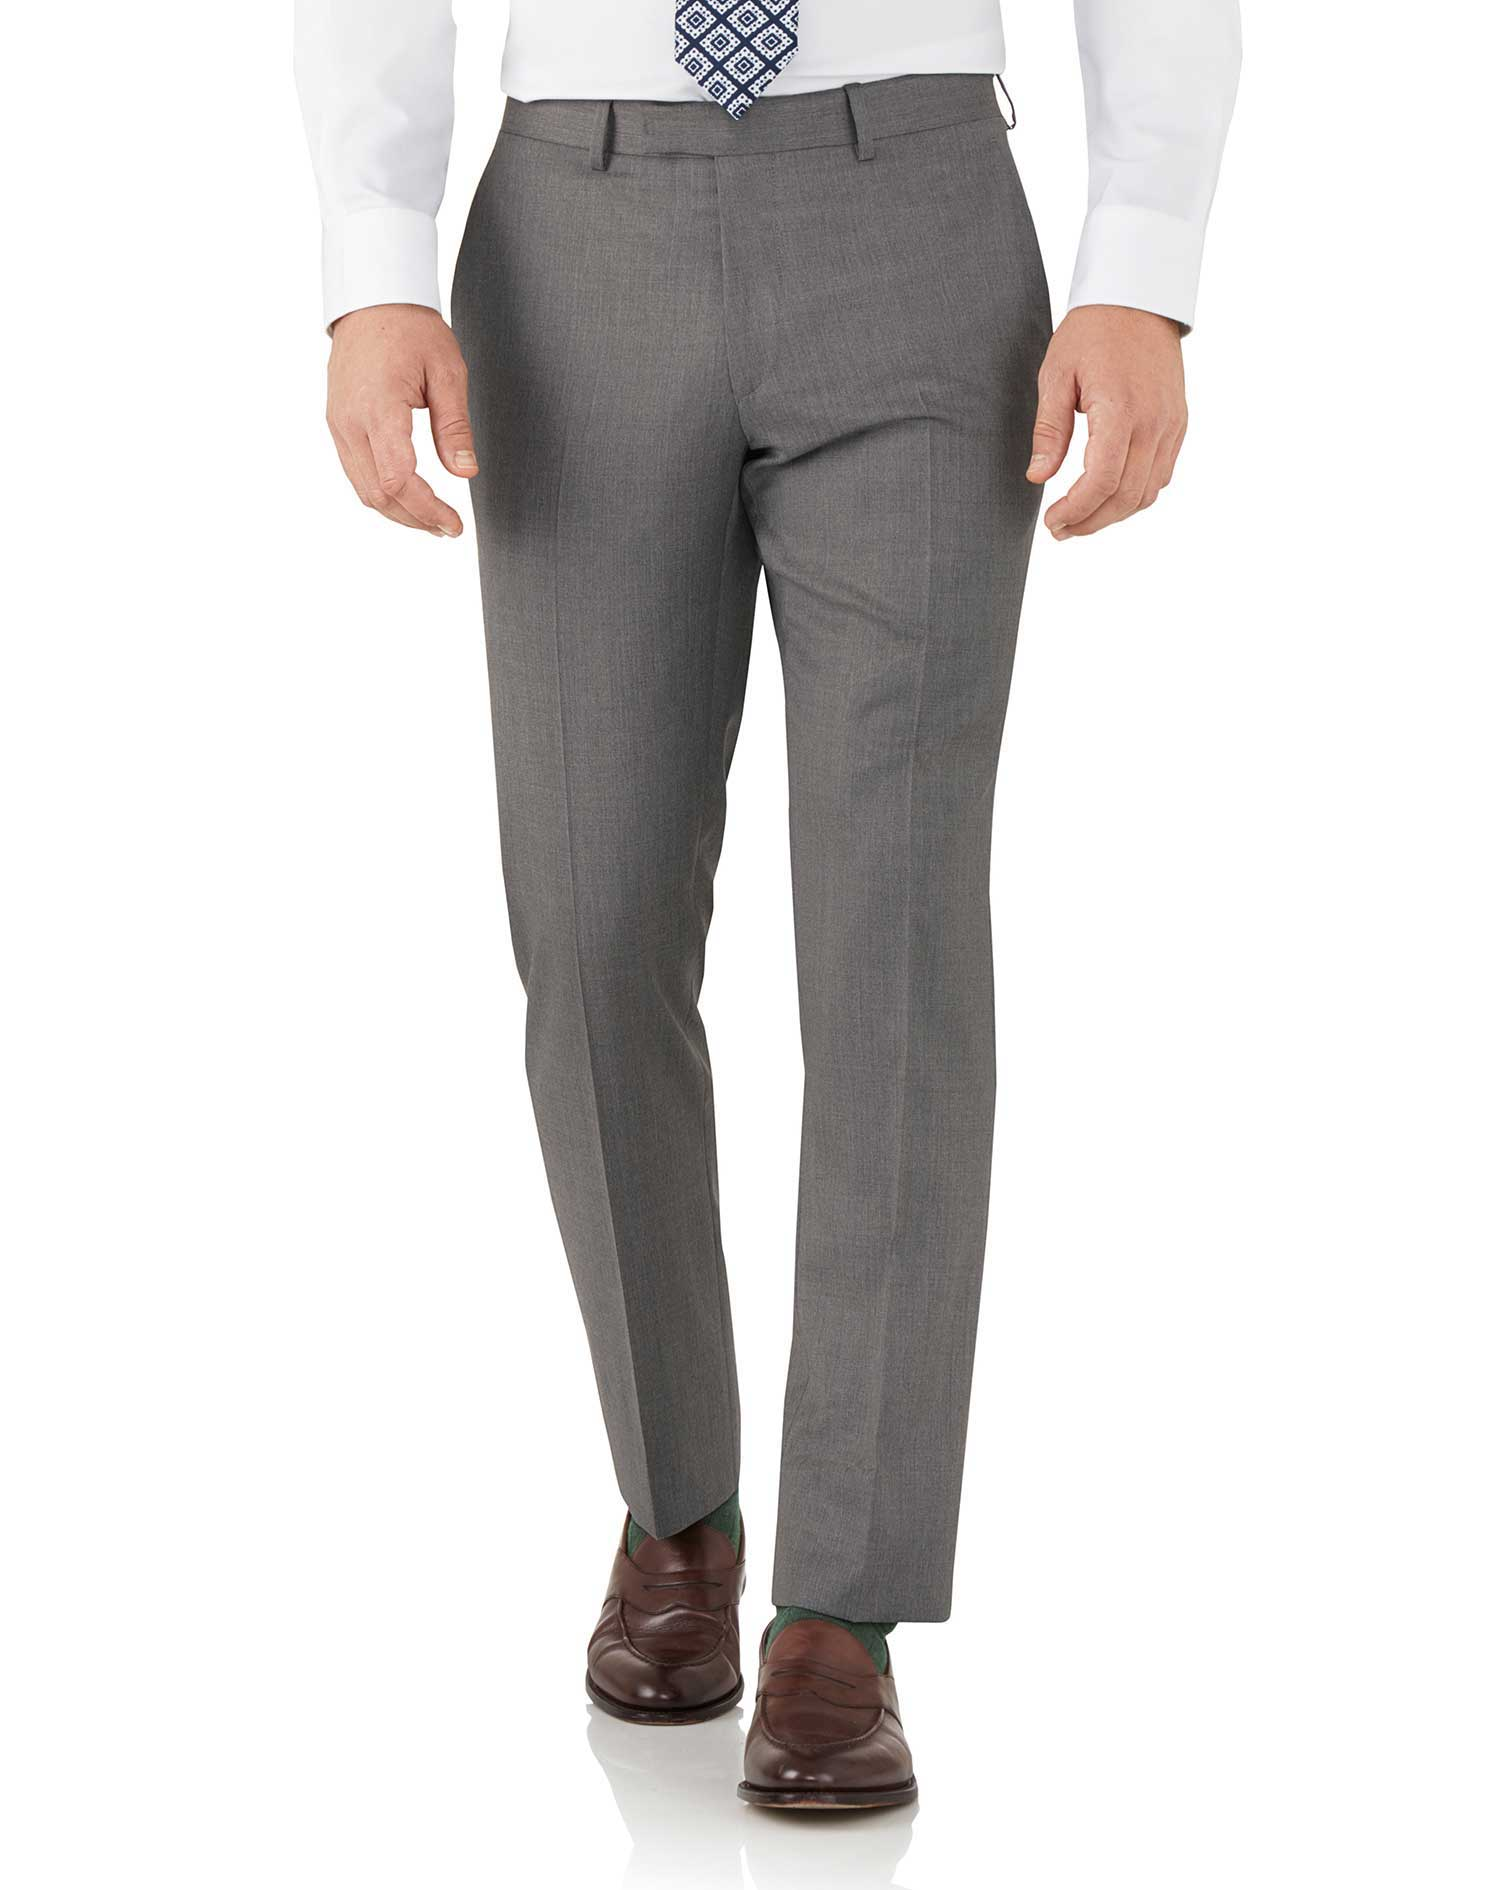 Grey Slim Fit Italian Suit Trousers Size W36 L32 by Charles Tyrwhitt